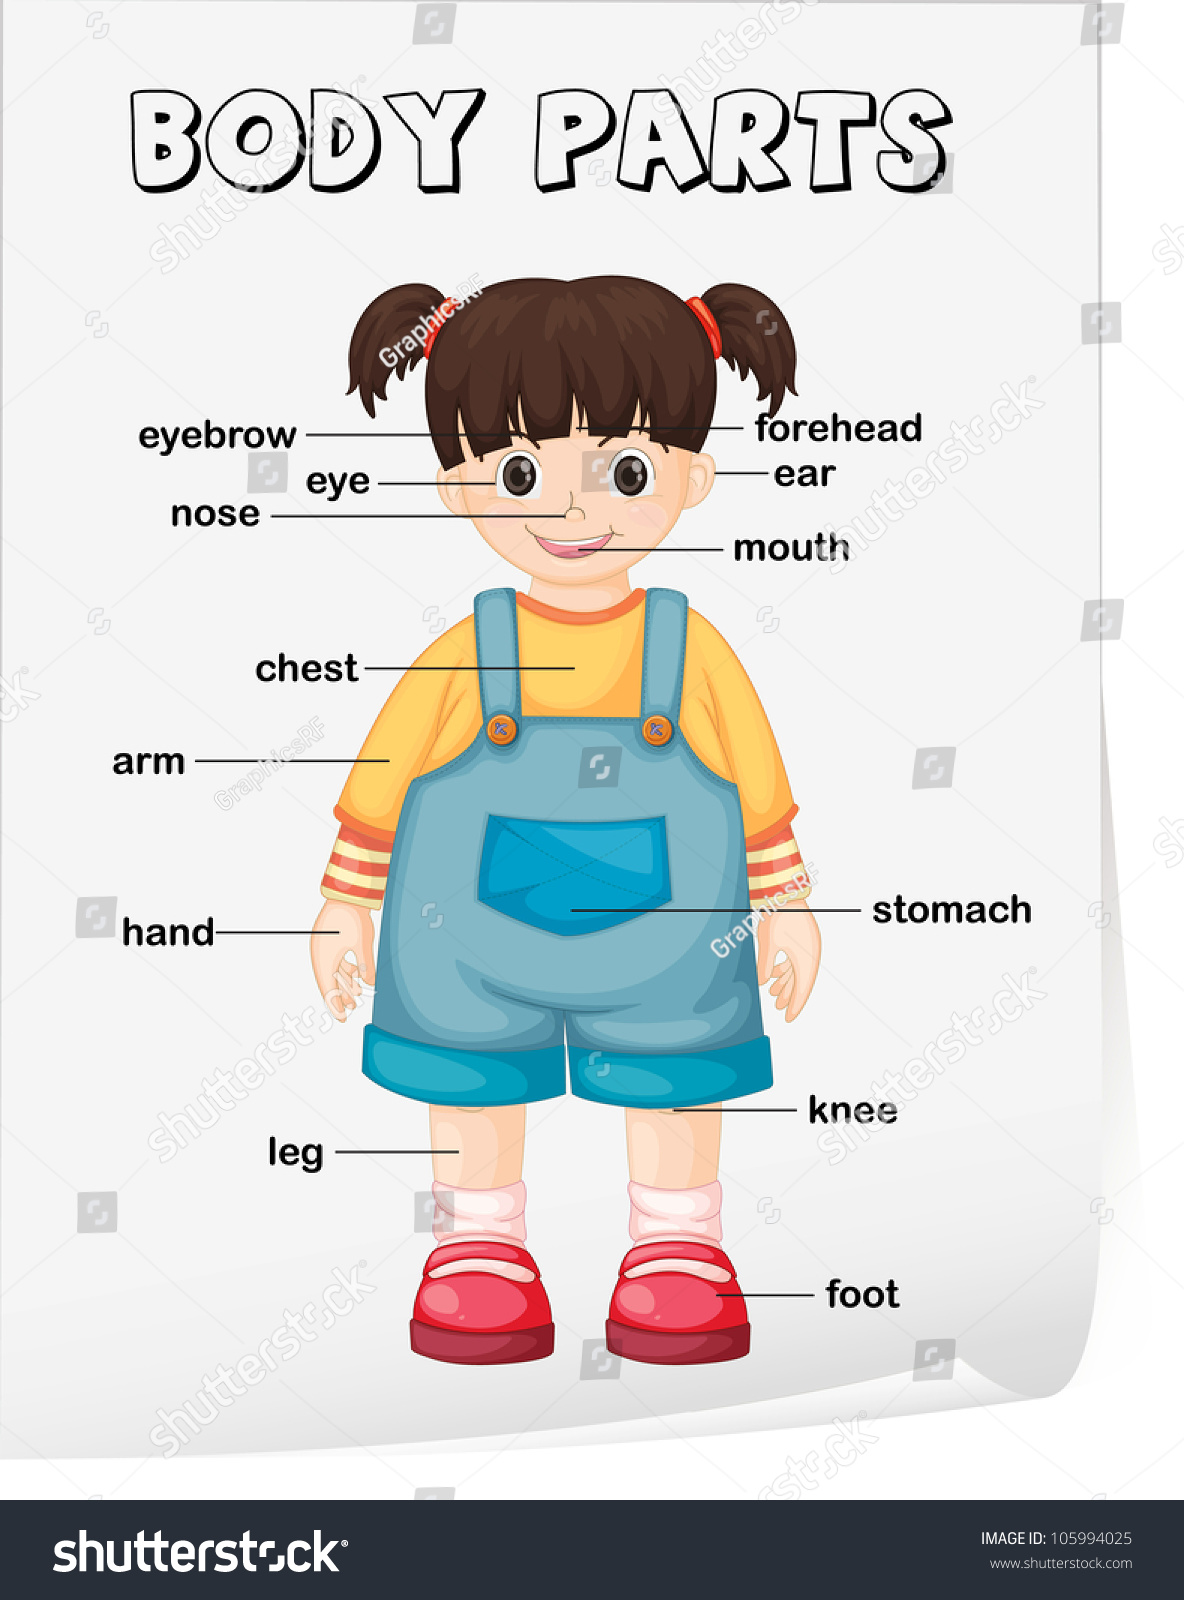 worksheet. Parts Of The Body Worksheet. Recetasnaturista Worksheet ...